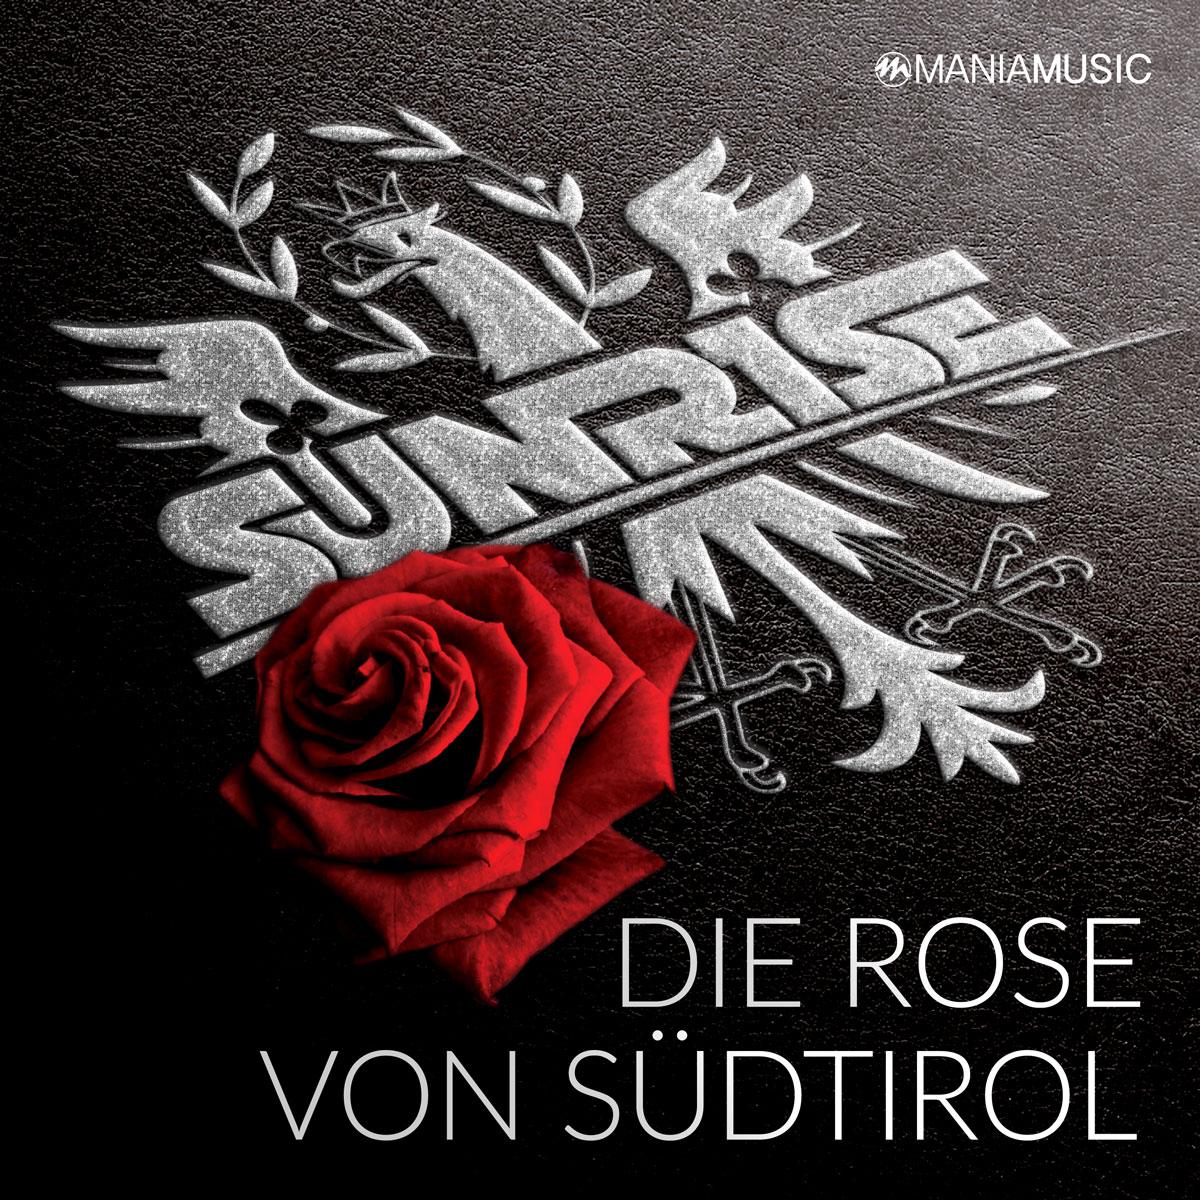 SUNRISE - Die Rose Von Südtirol (Mania Music)